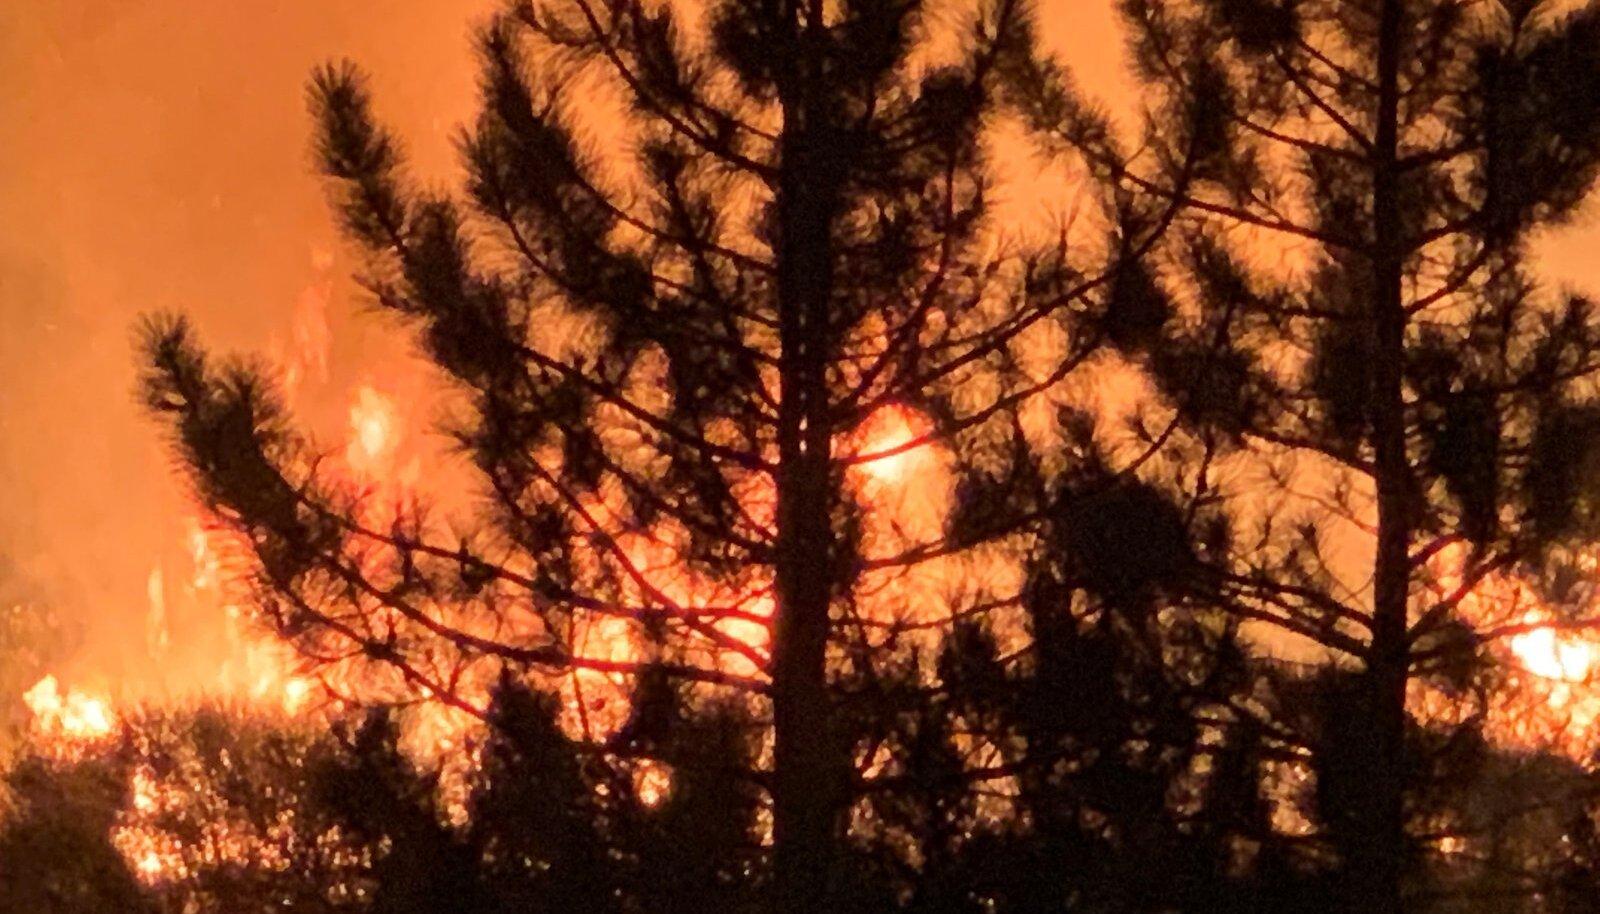 Bobcat Fire burns in Mount Wilson, California